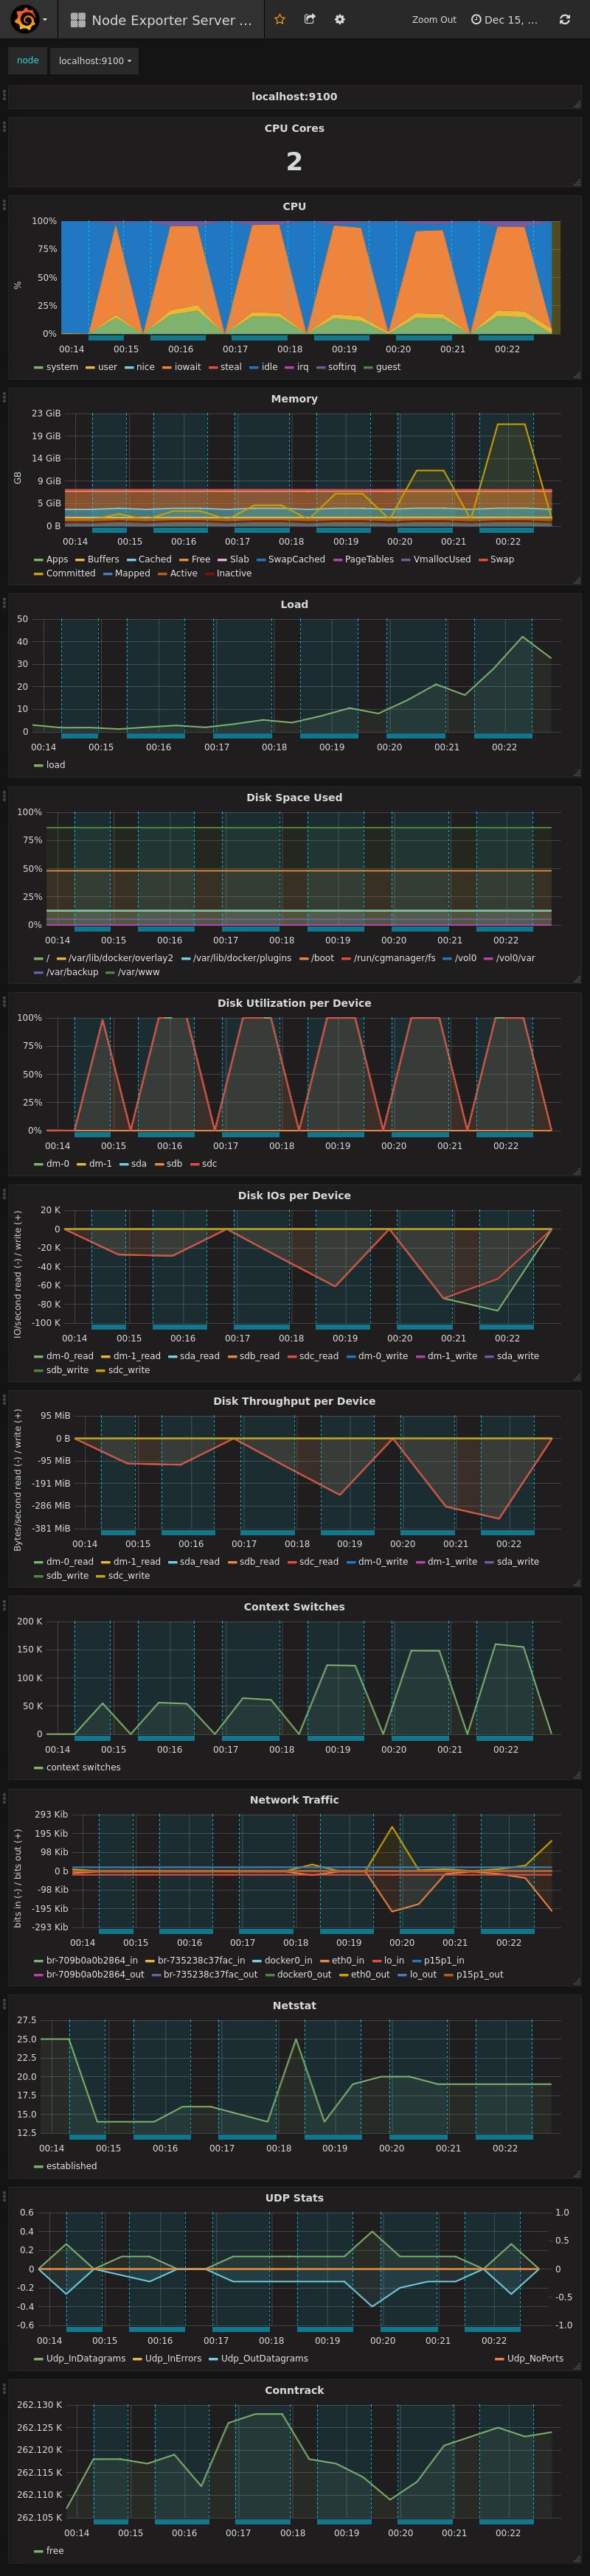 nttcomadvent2017_node-exporter-server-metrics_2017-12-14T15:13:48.000Z_2017-12-14T15:22:58.000Z.png